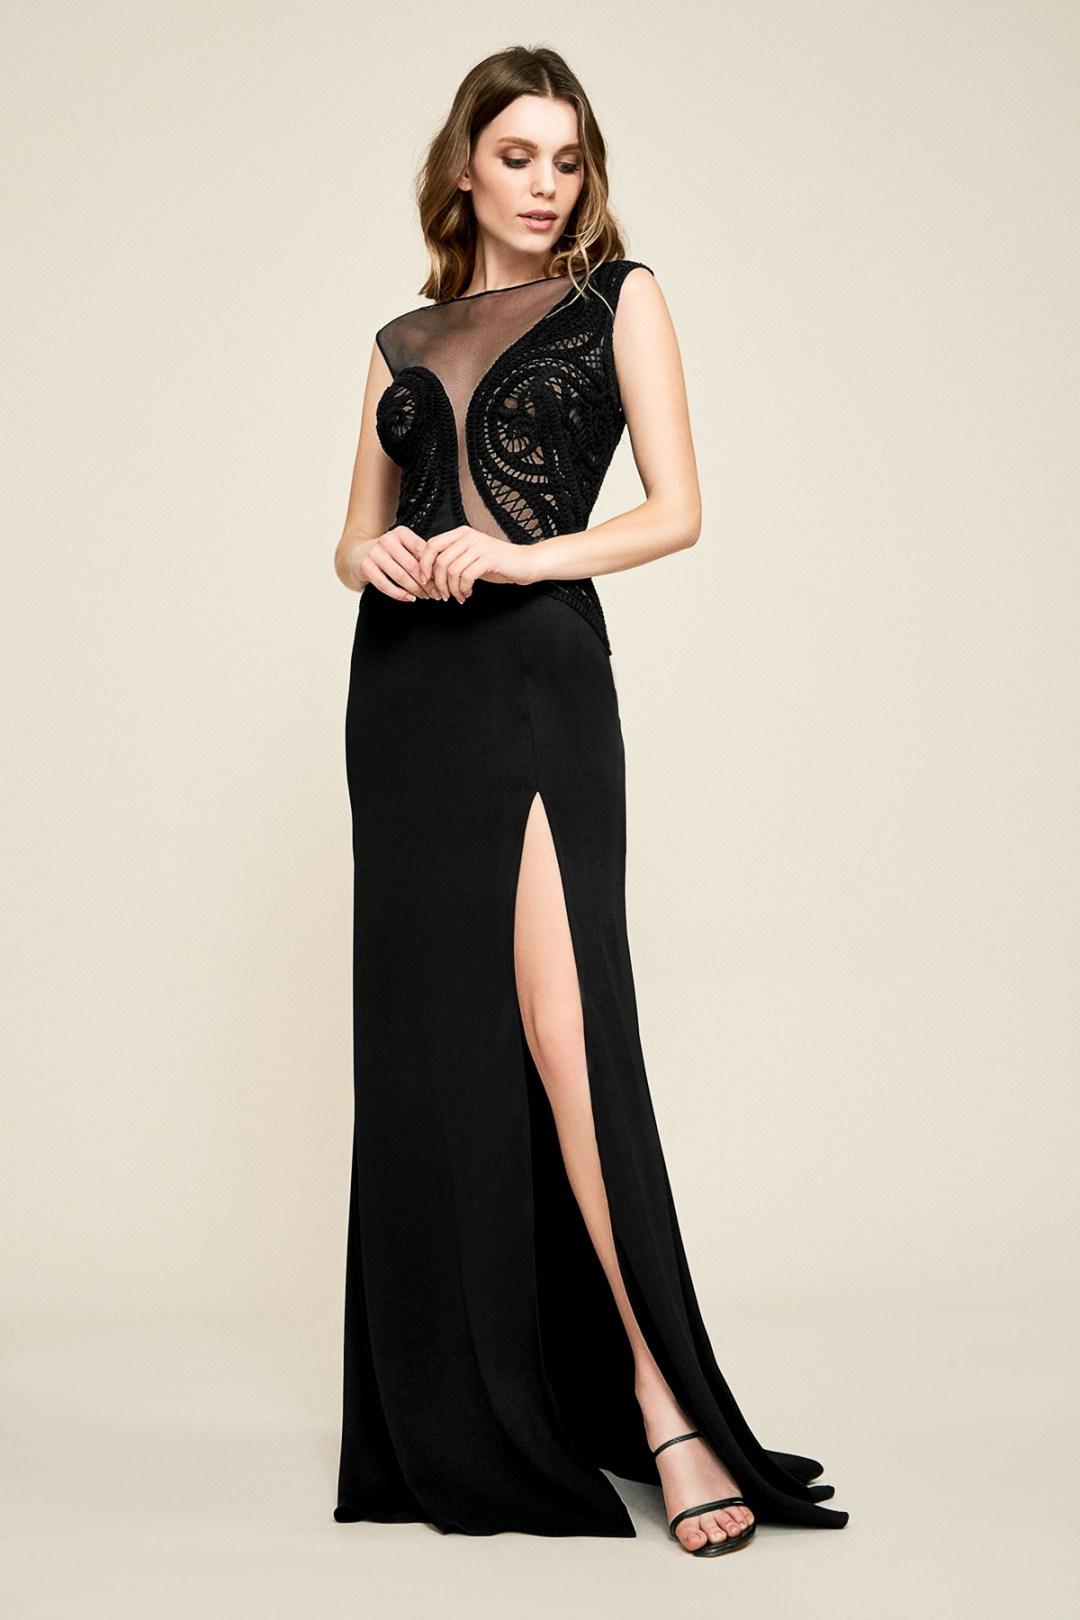 Haute Couture Fashion Week Extra Big Size Mysty Black Zip Hoodie Blouse Fit 6l Plus Tadashi Shoji 46800 Cruz Crochet Crepe Gown